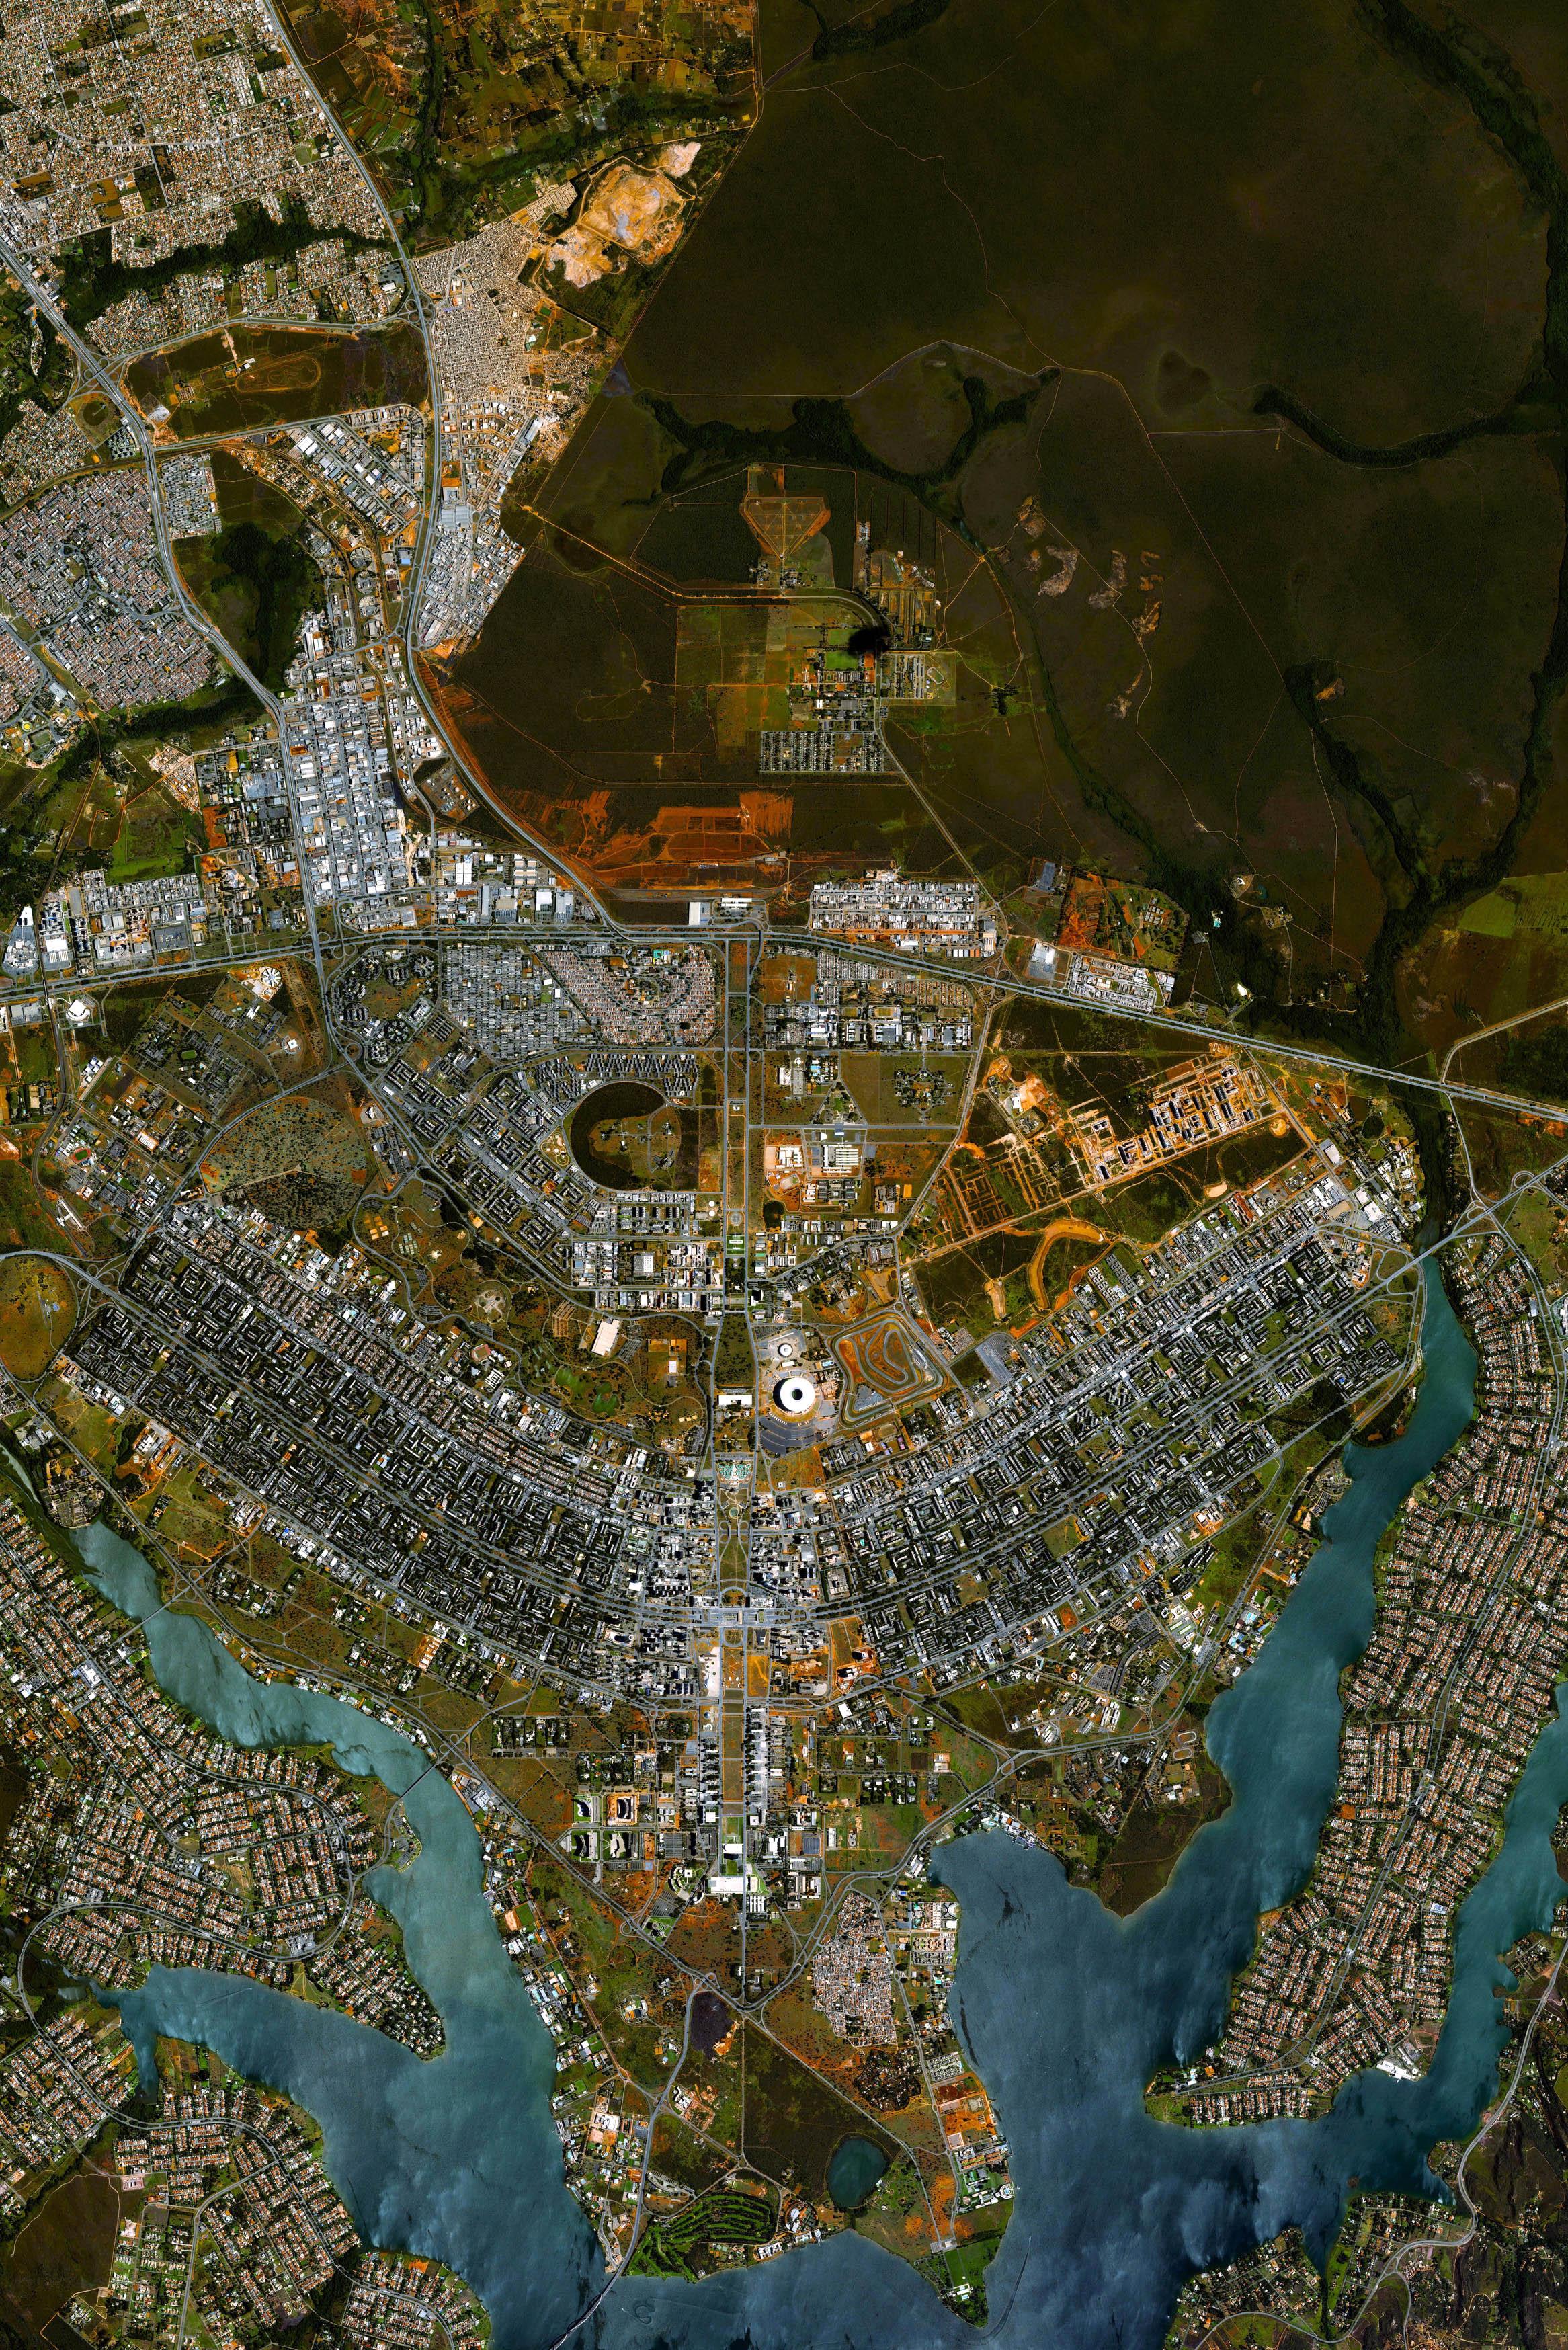 Brasilia: Reverie Embodied as City